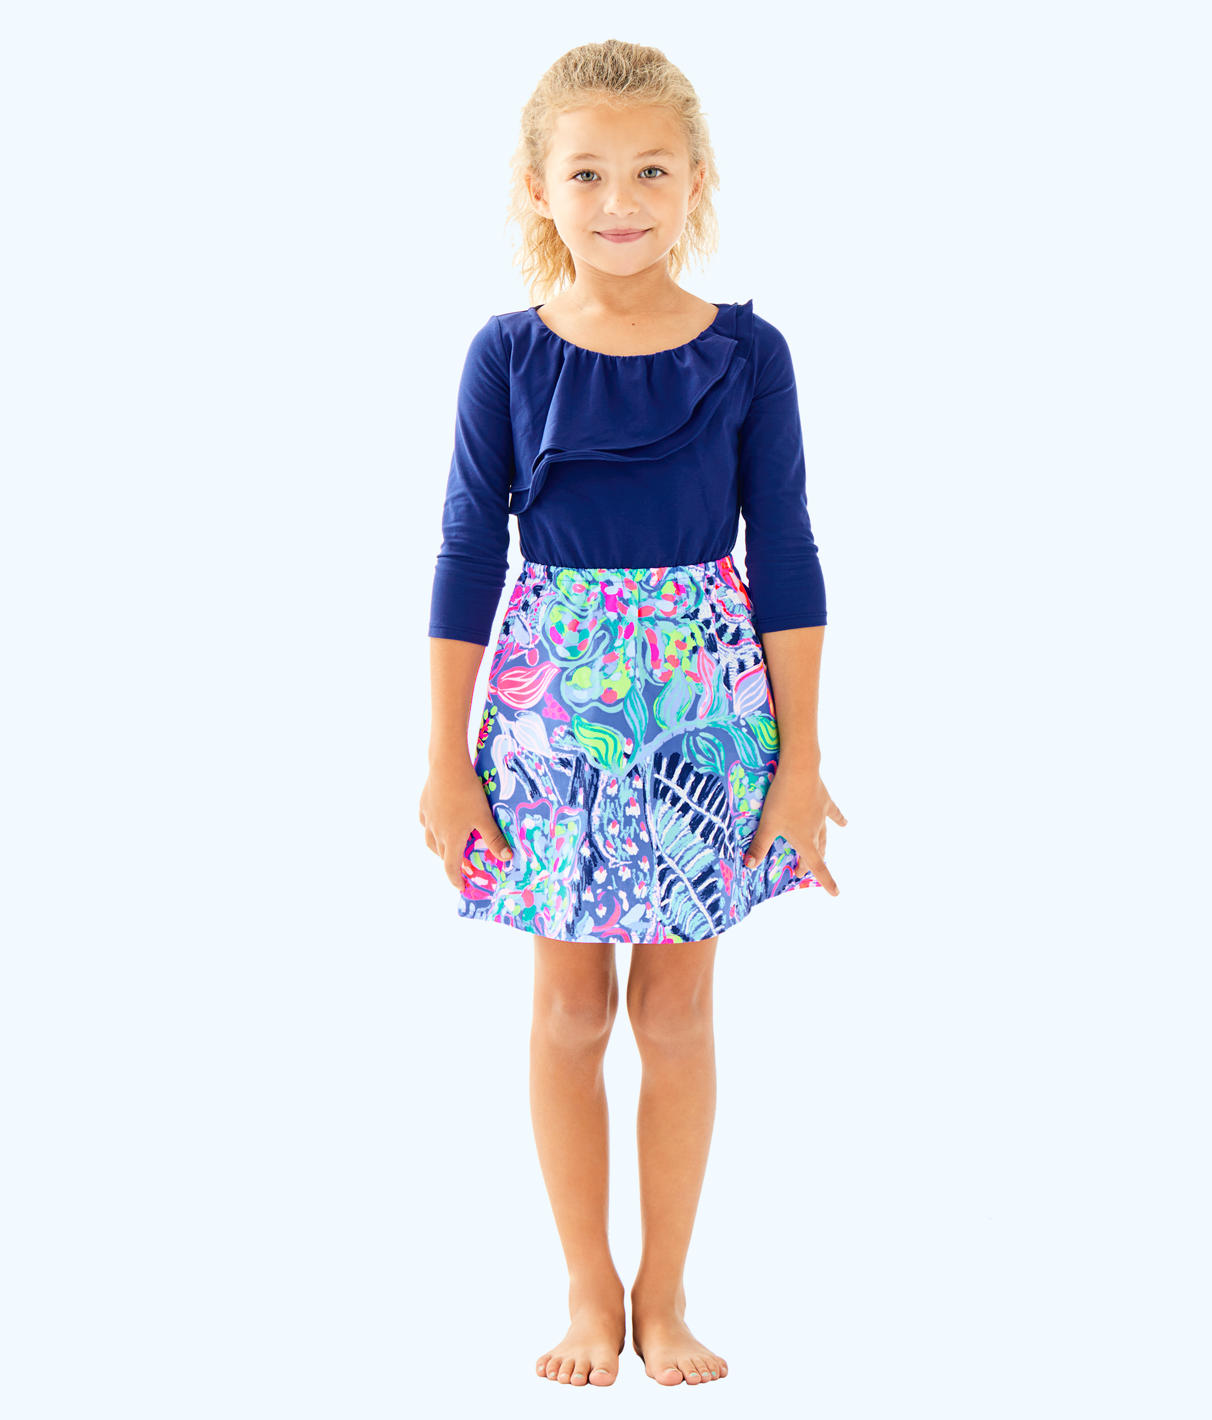 Lilly Pulitzer Lilly Pulitzer Girls Hazel Dress